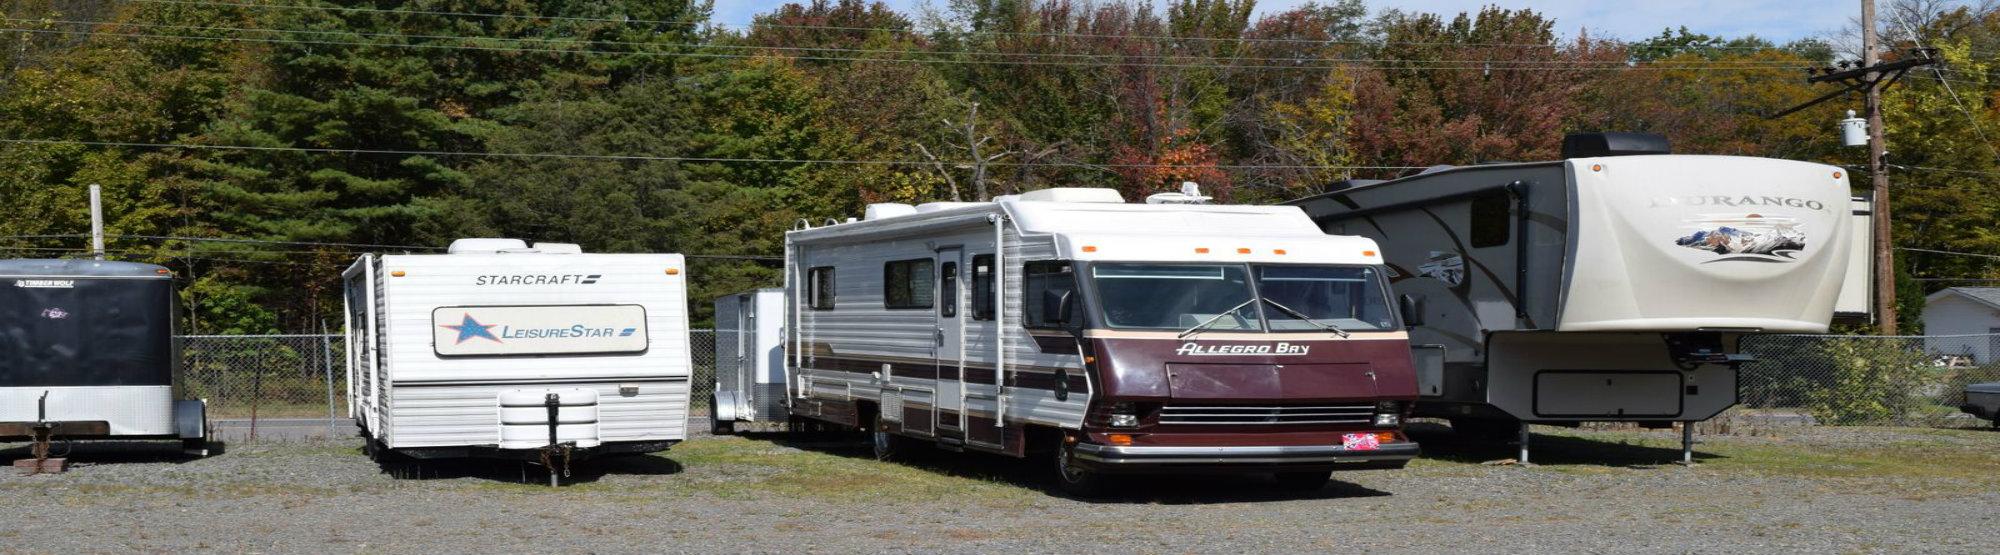 RV and trailer parking in Wymart, PA